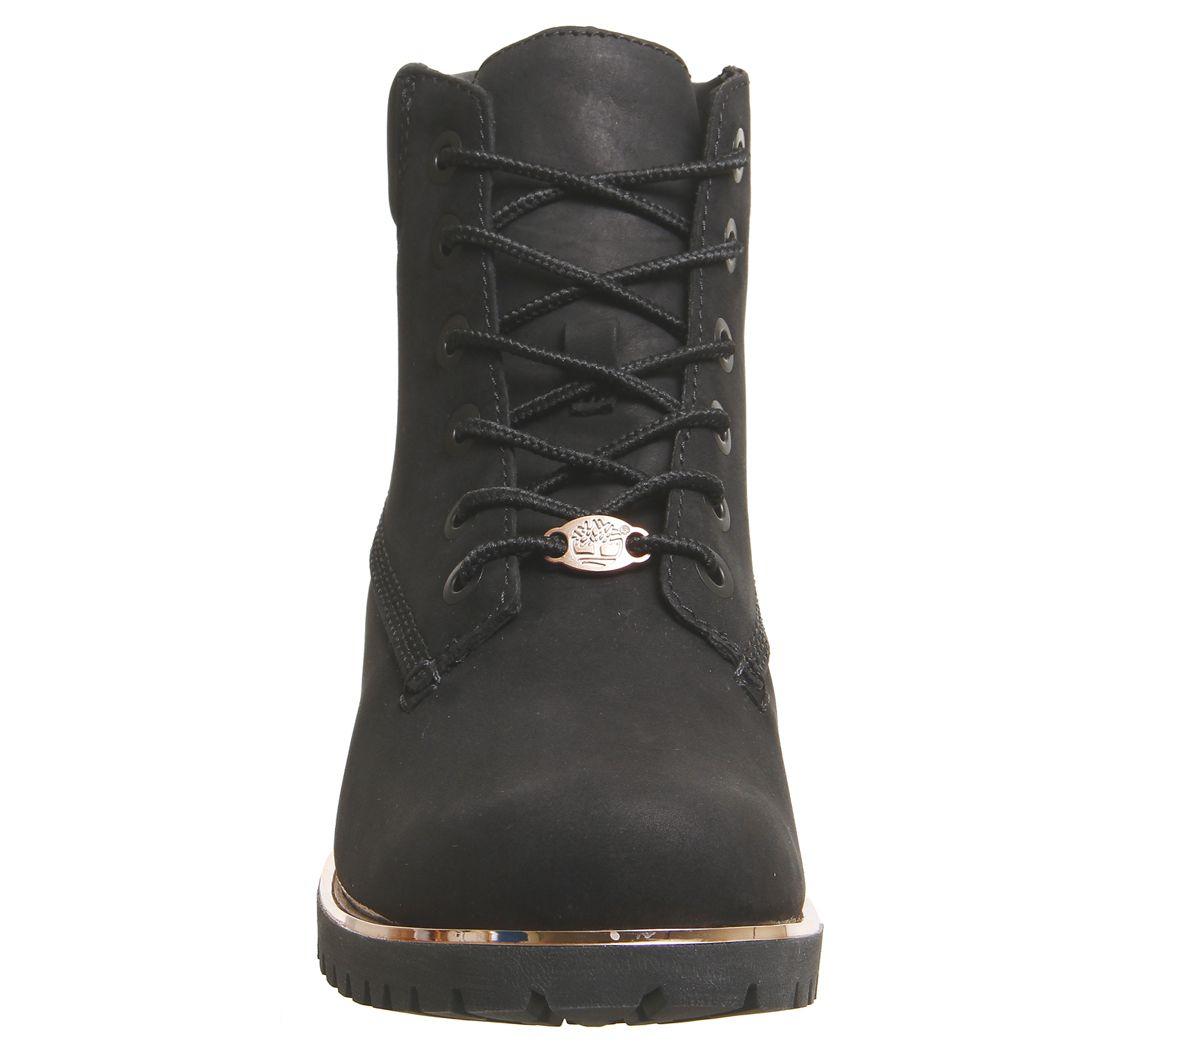 c409345cd3 Dettagli su Donna Timberland Slim Premium 15.2cm Stivali Neri Rosa Dorato  Rand Stivali